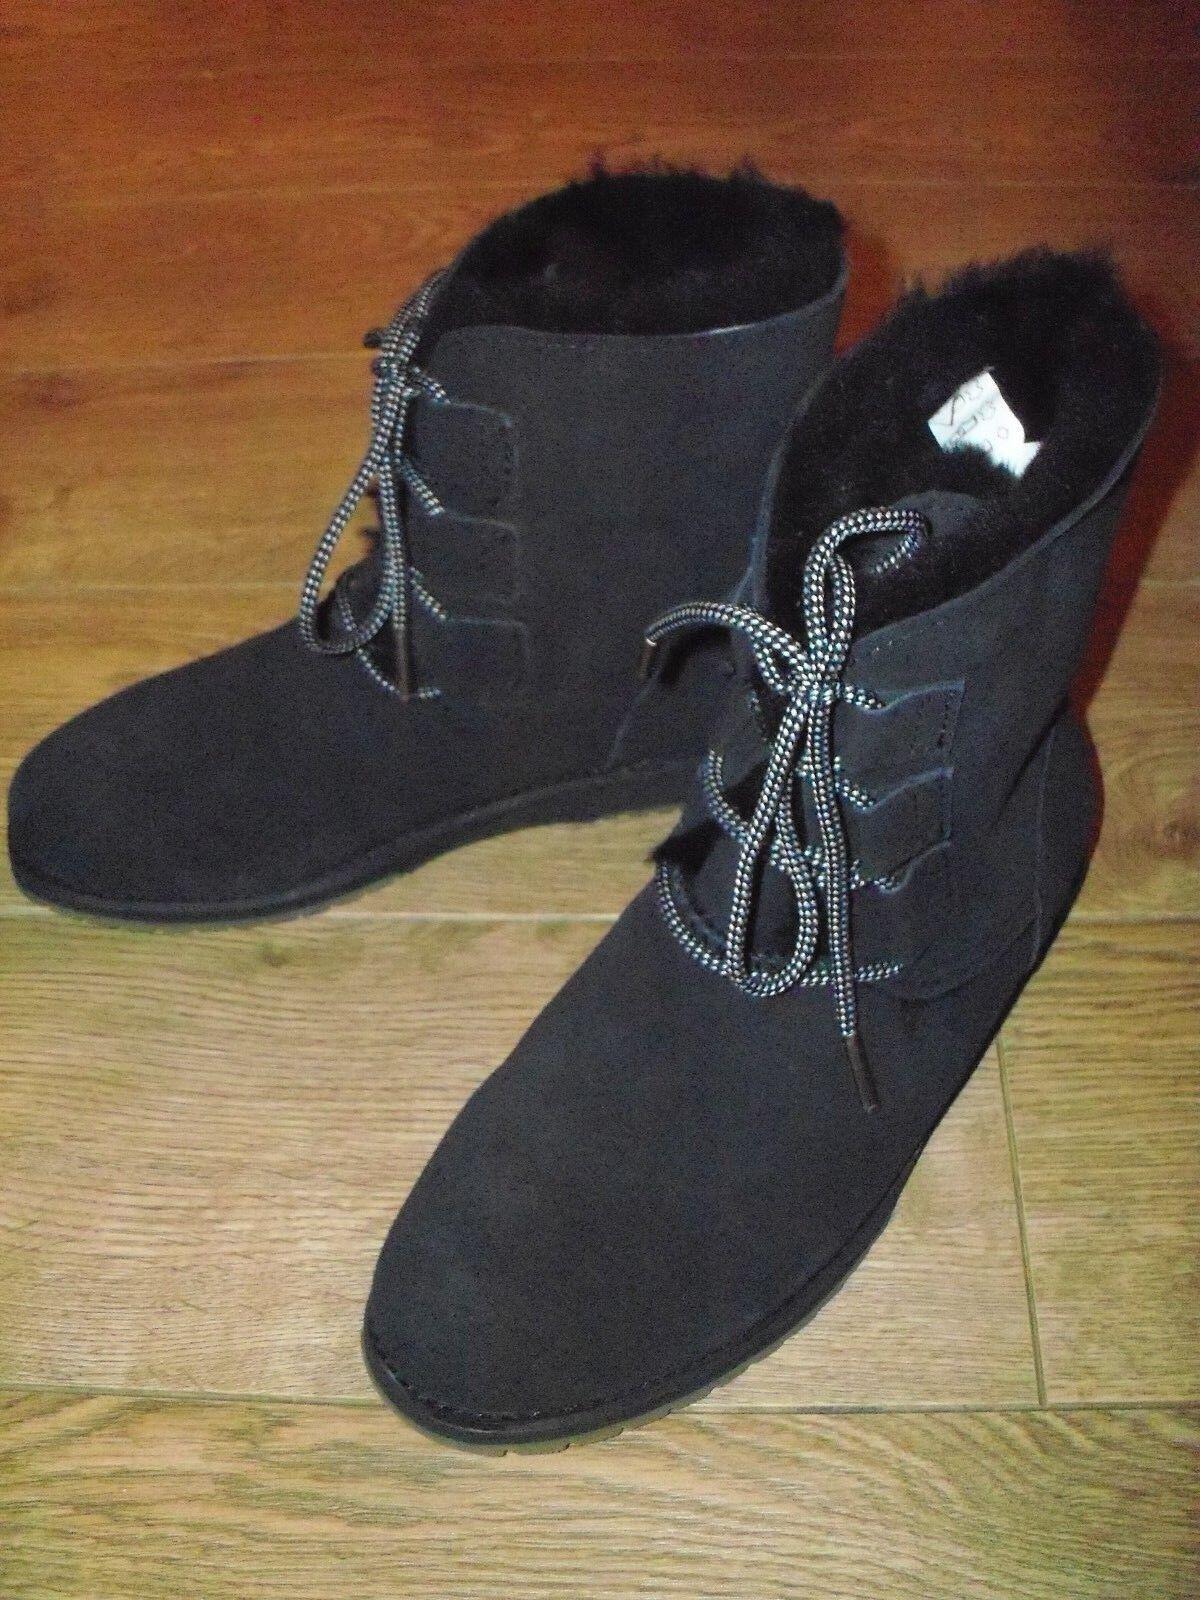 Nuevo Emu Illawong Oveja Australiana Australiana Australiana botas Números Gb 6 Negro - Ver Desc  forma única